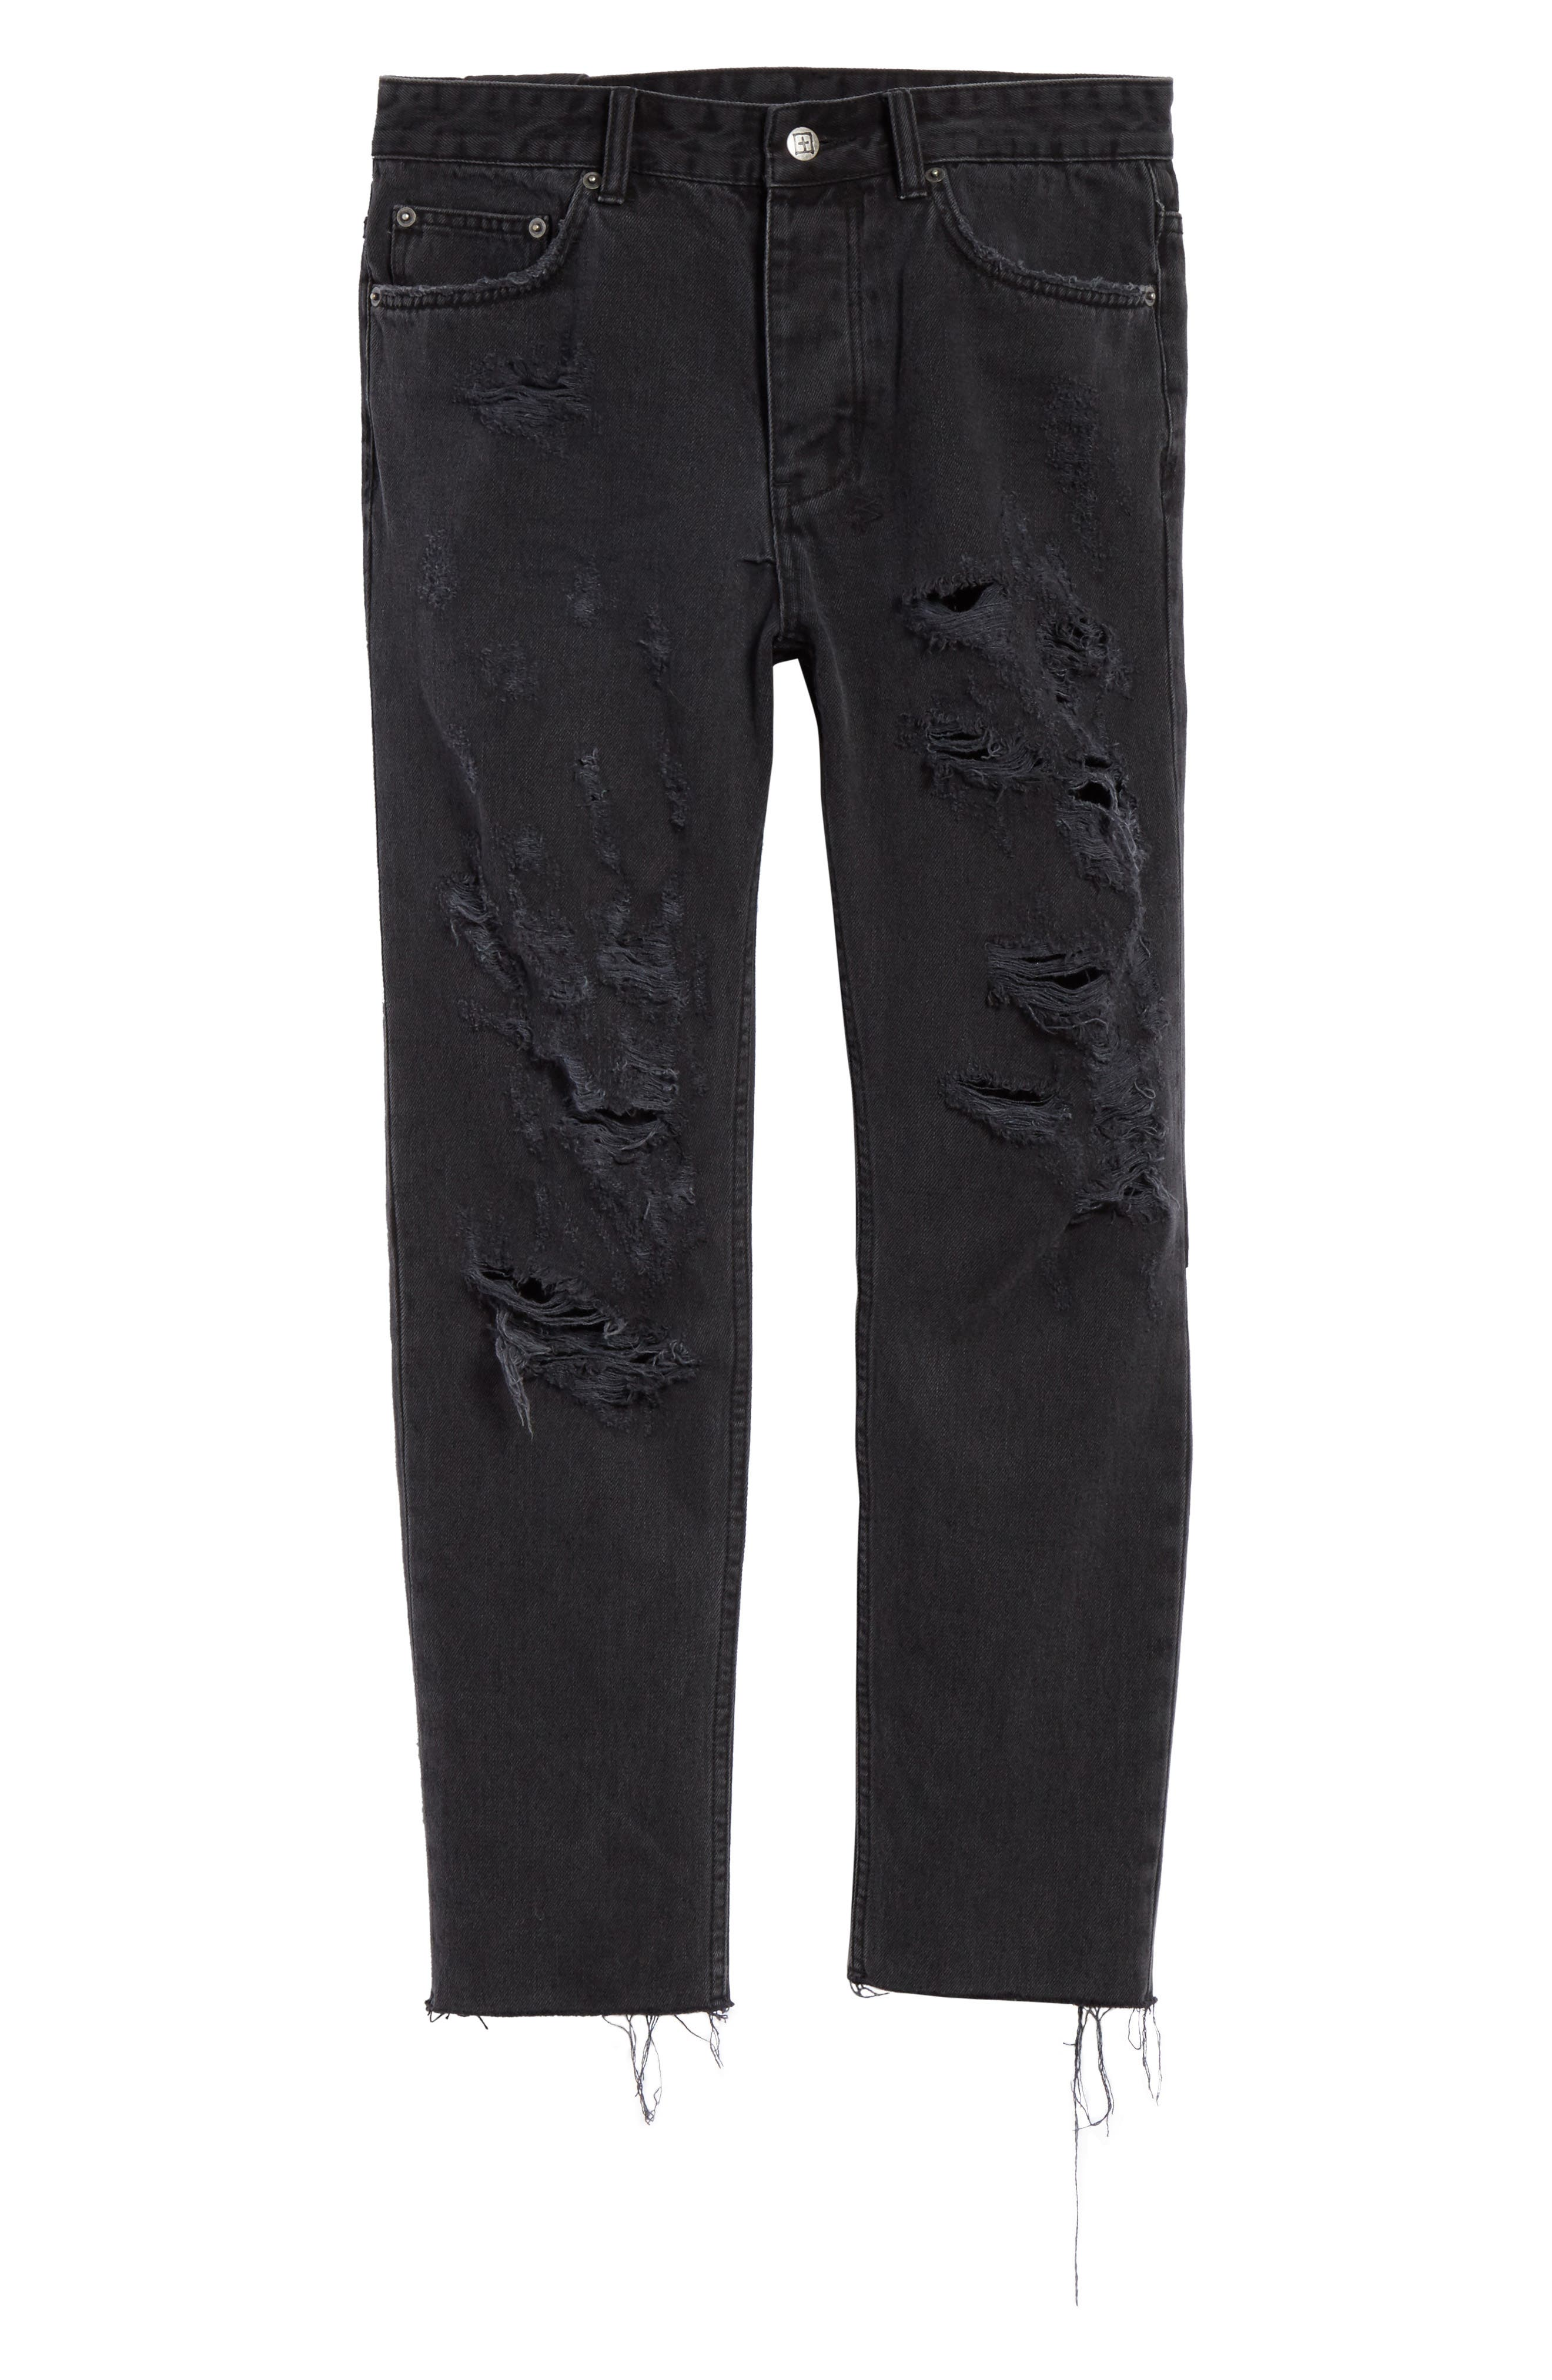 Chitch Chop Rat Attack Jeans,                             Alternate thumbnail 6, color,                             Black